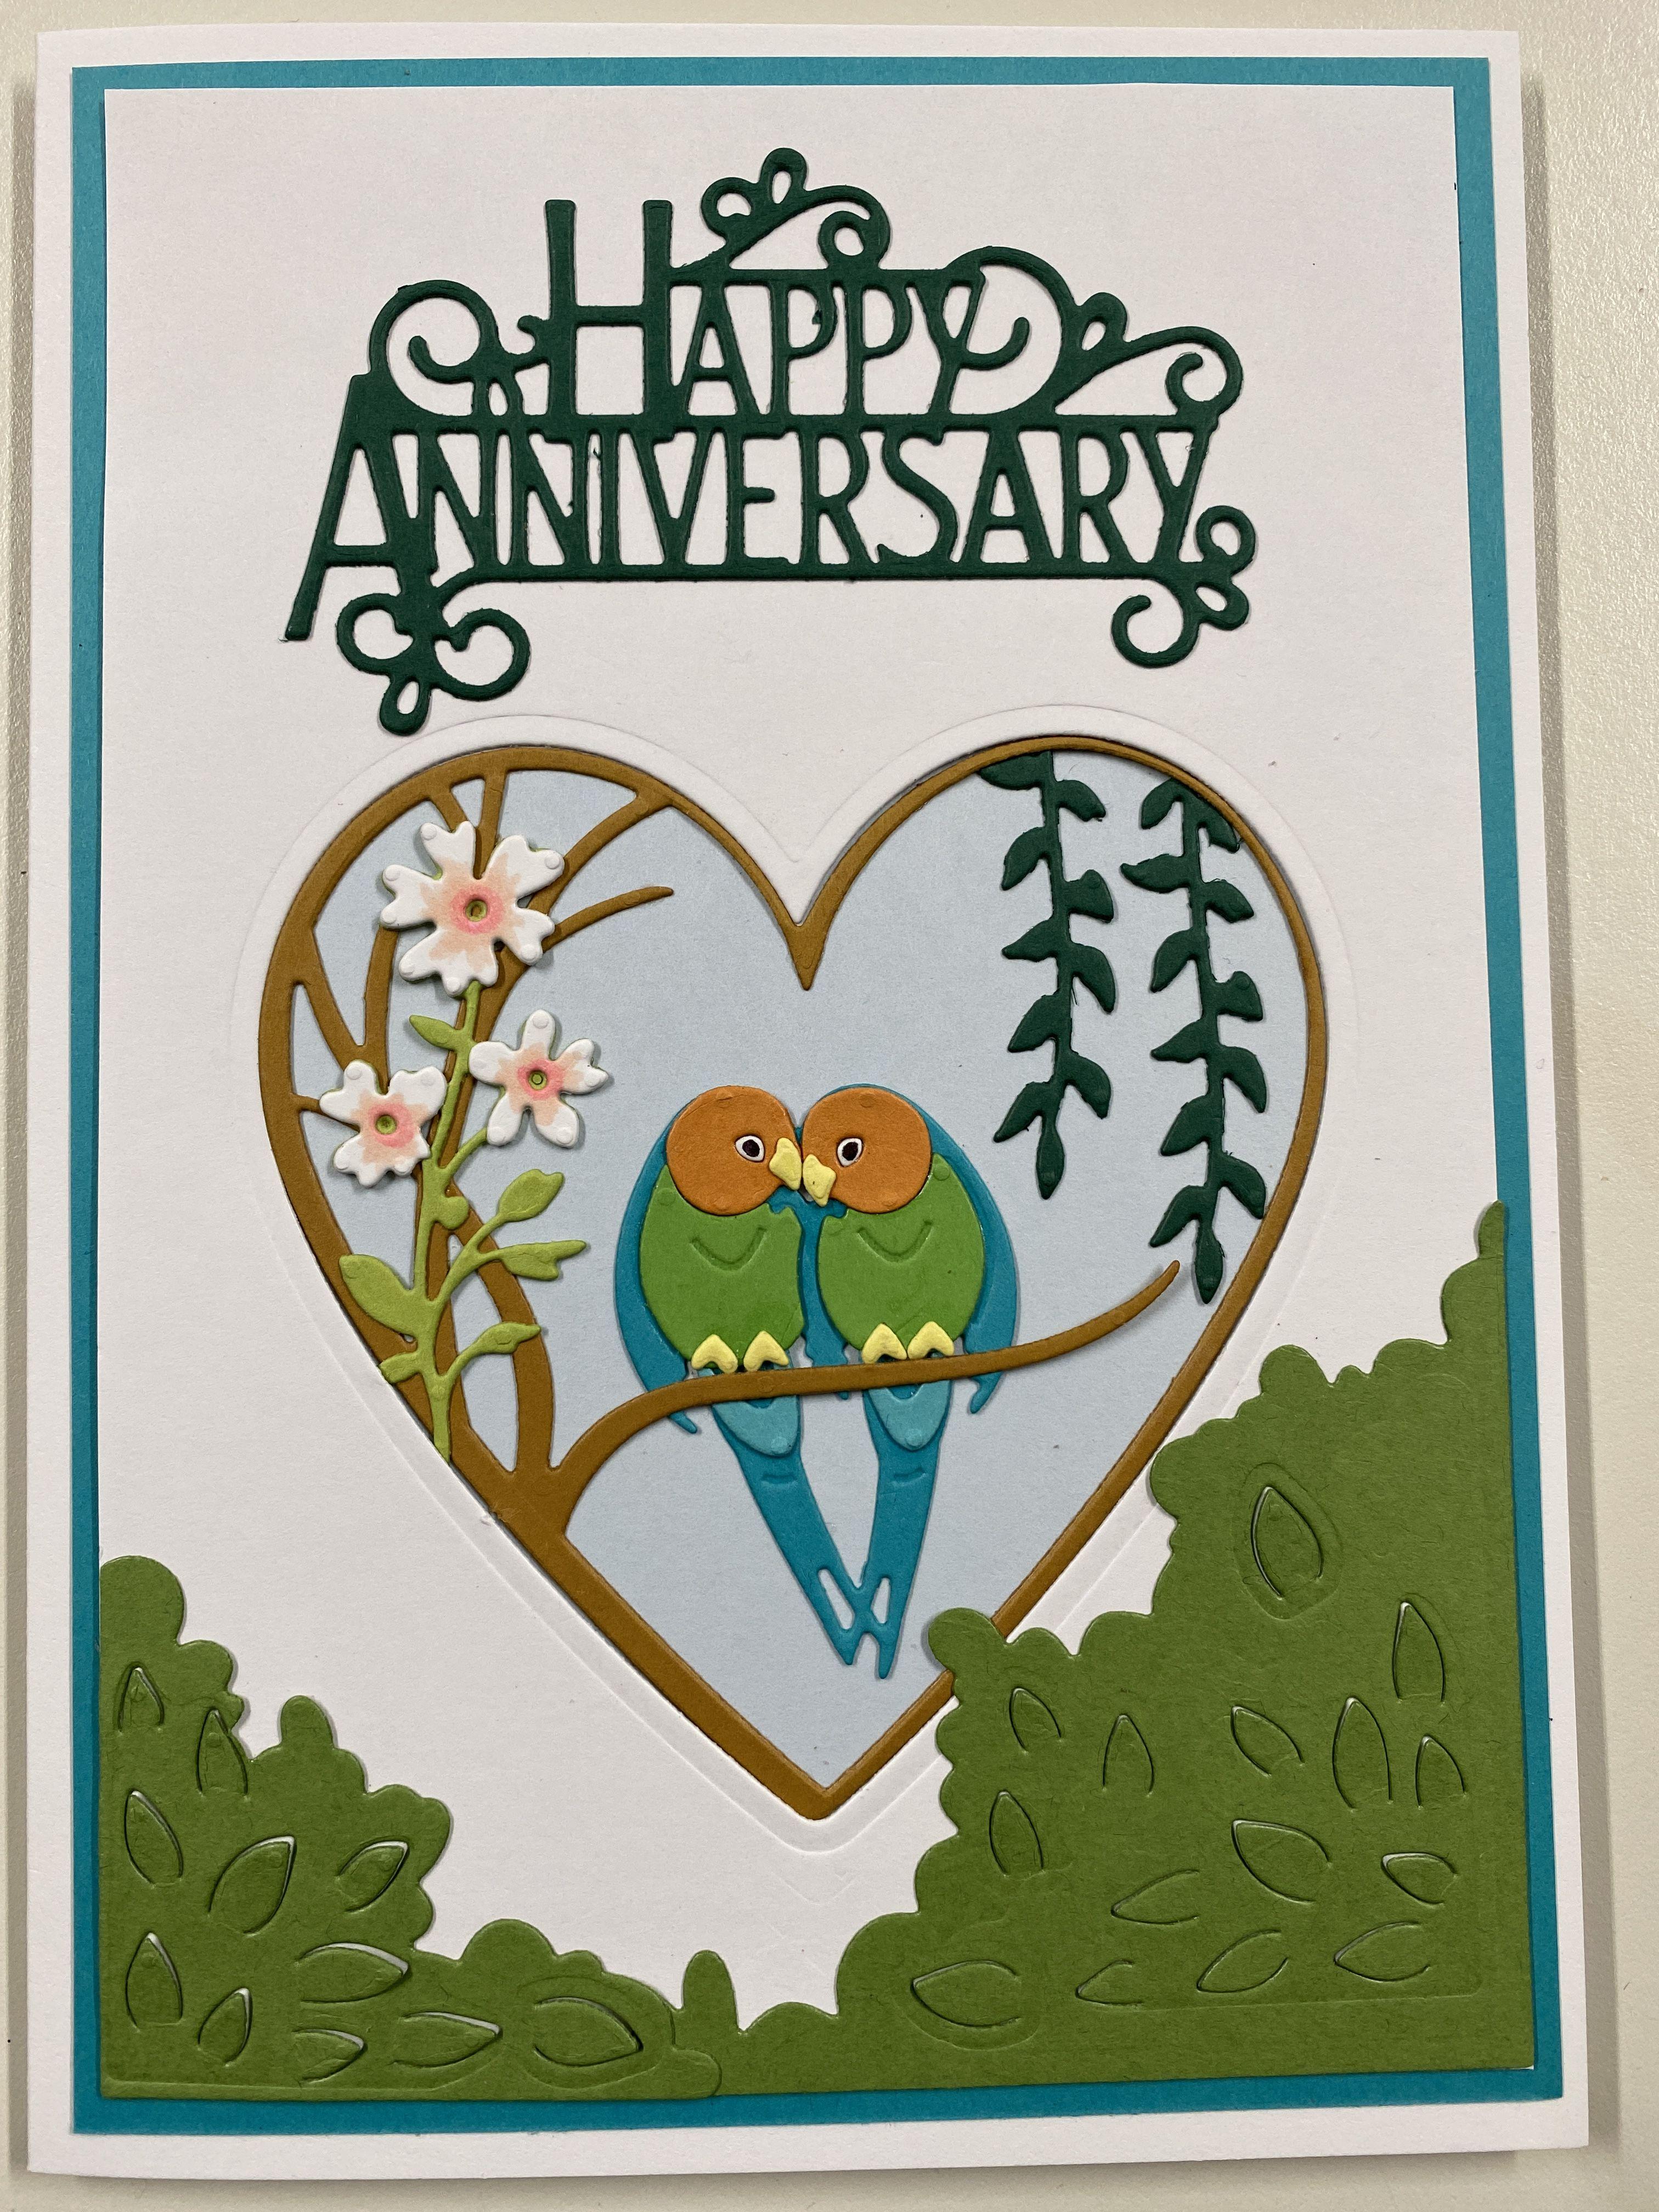 Wedding Anniversary Cards Handmade Hands On Africa You Choose Design Ebay Happy Anniversary Cards Anniversary Cards Wedding Anniversary Cards